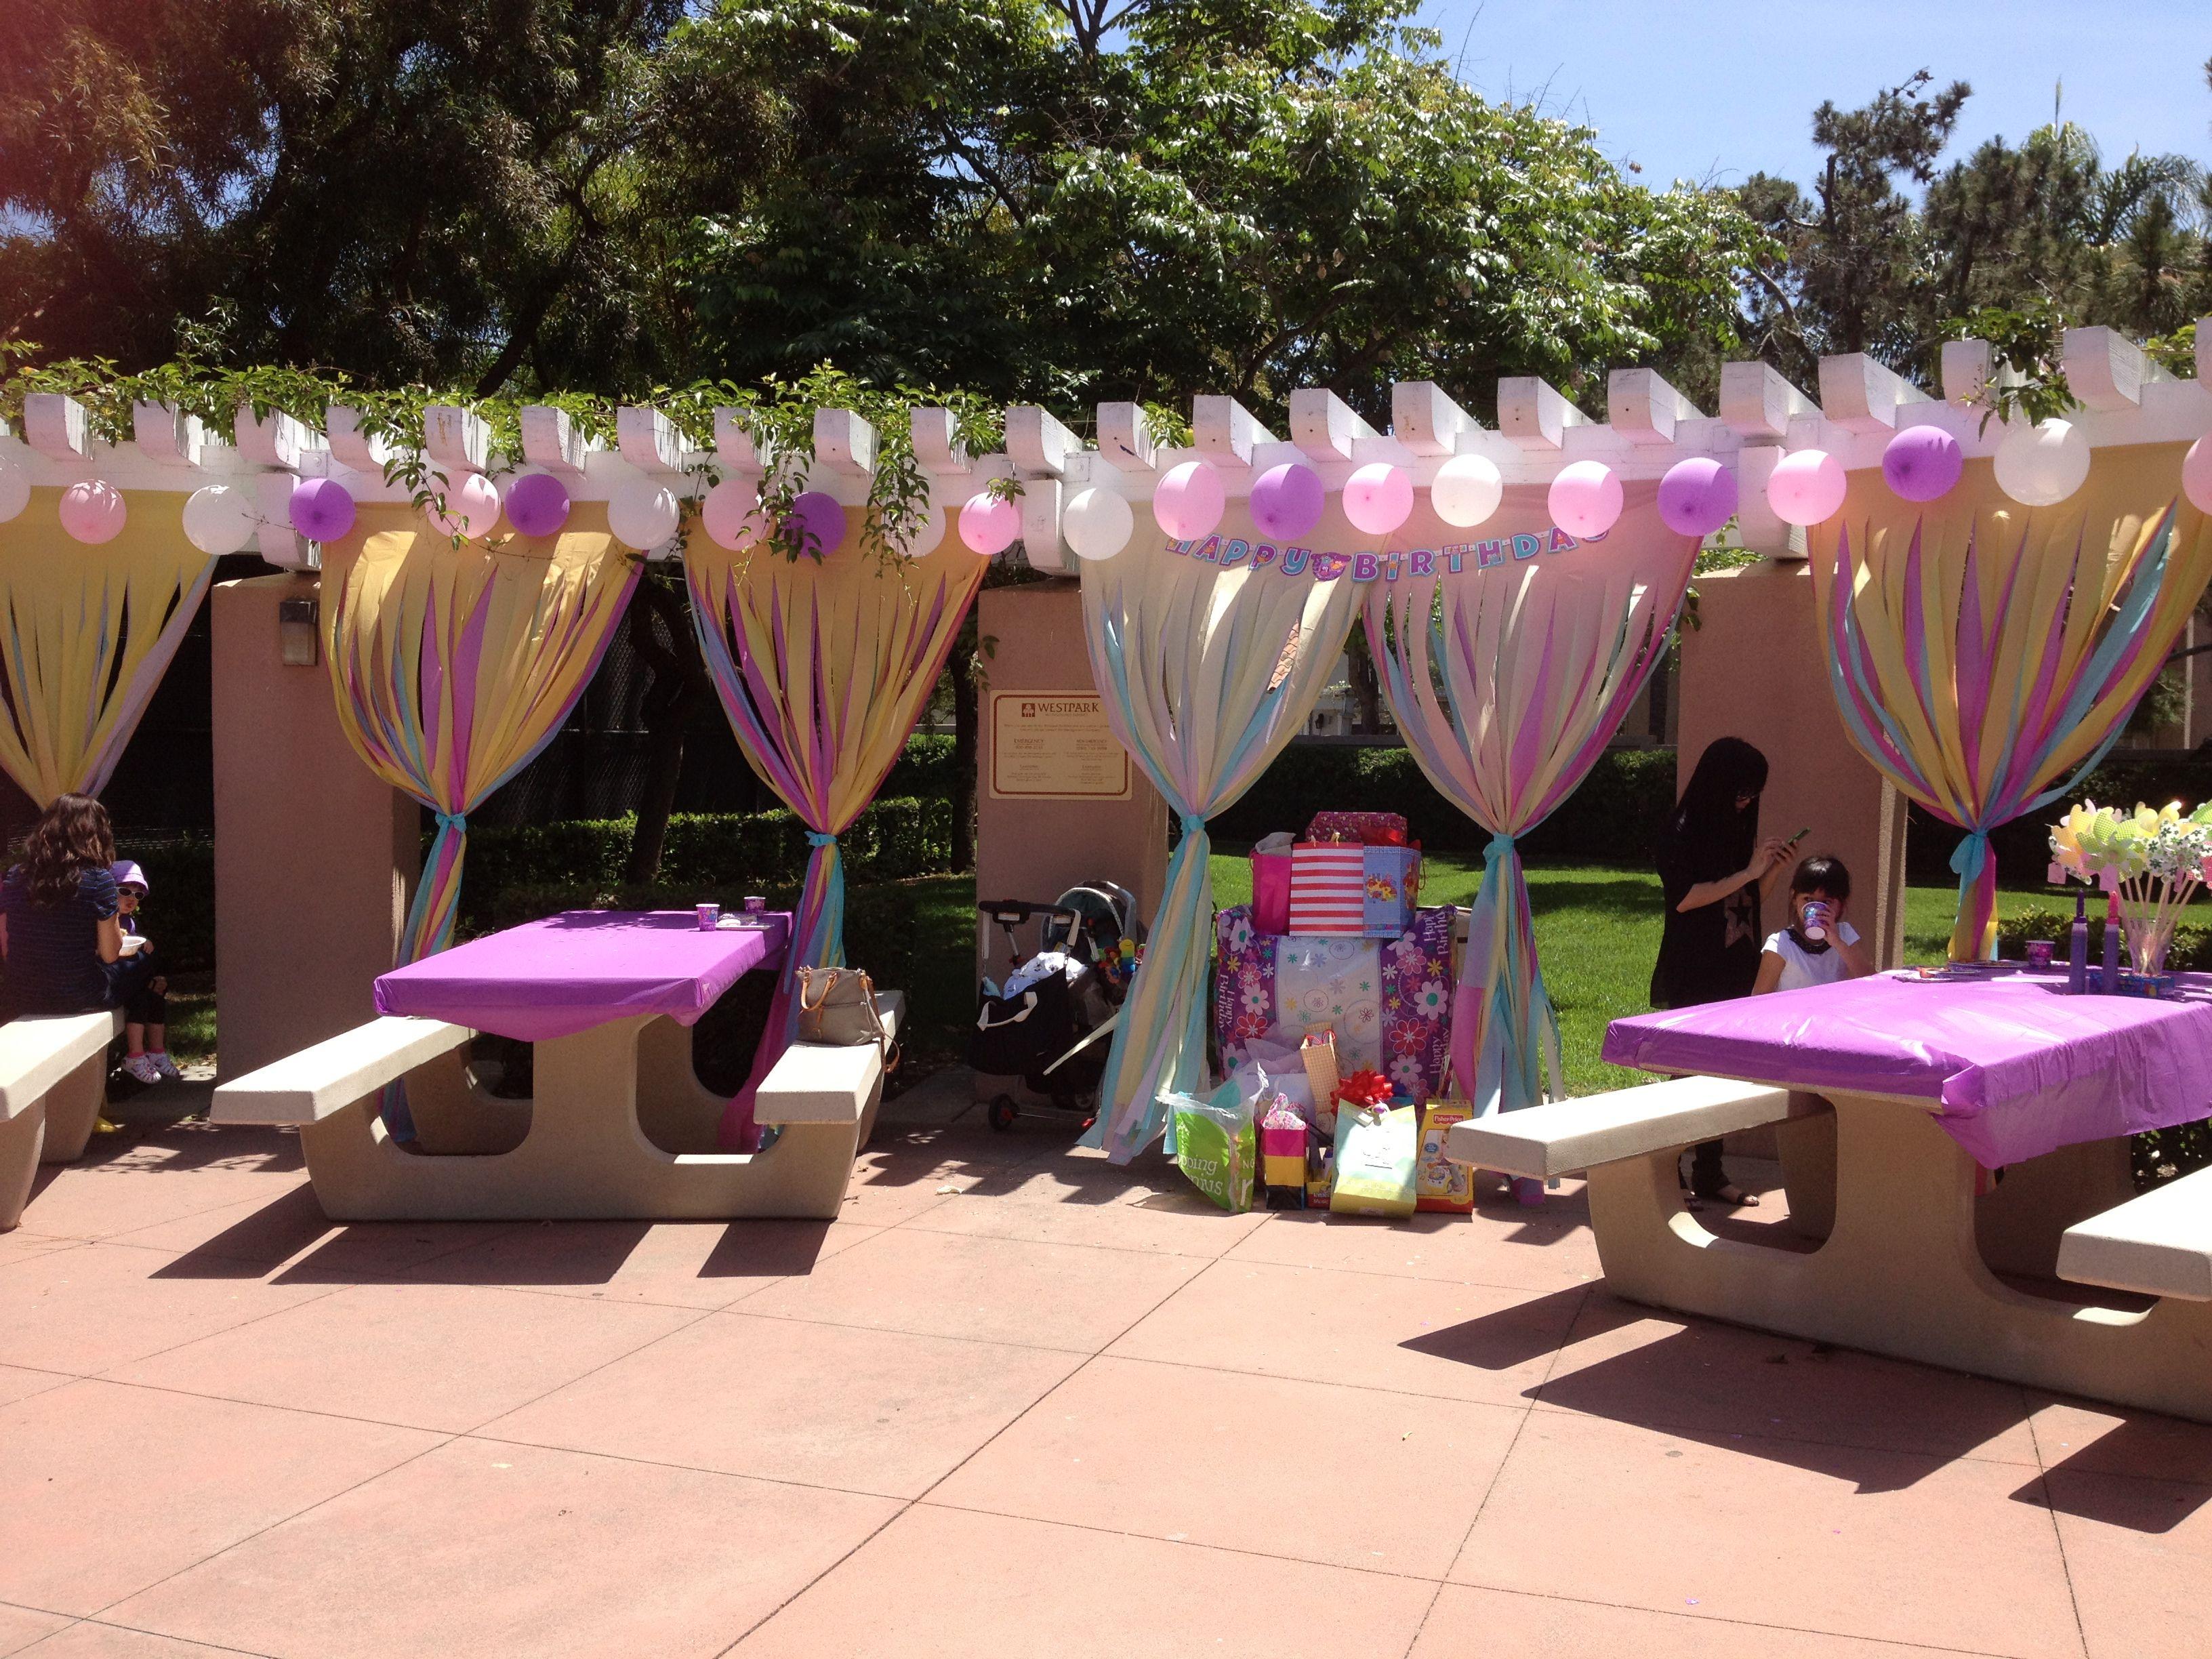 Birthday Decor At The Park Birthday Party At Park Park Party